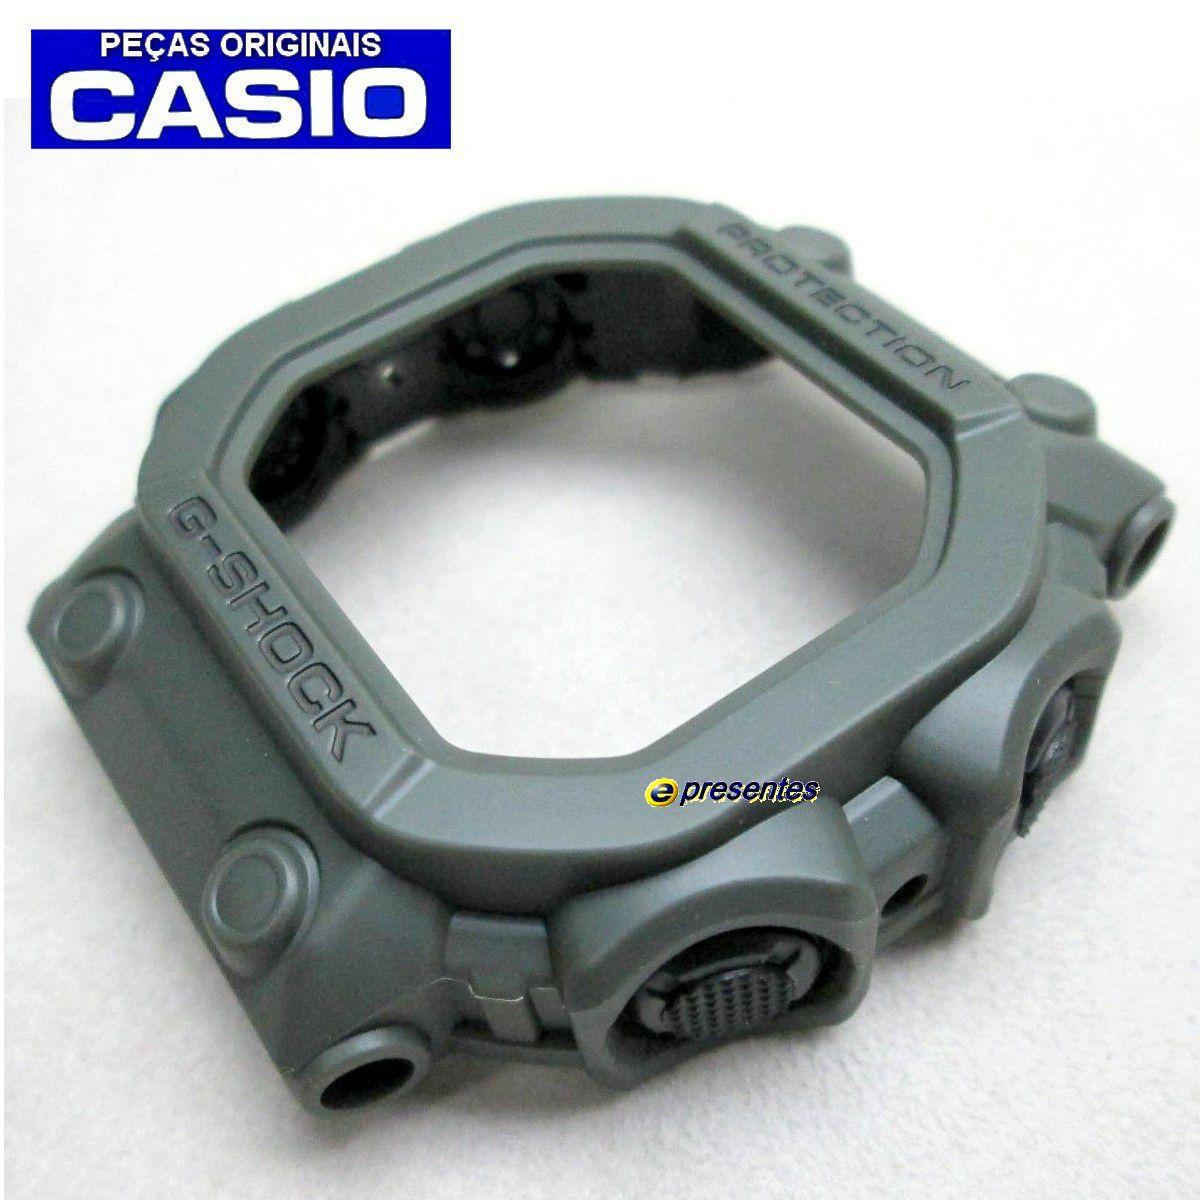 Pulseira + Bezel GX-56kg-3  GWX-56kg-3 Casio G-Shock Verde Militar Fosco  - E-Presentes